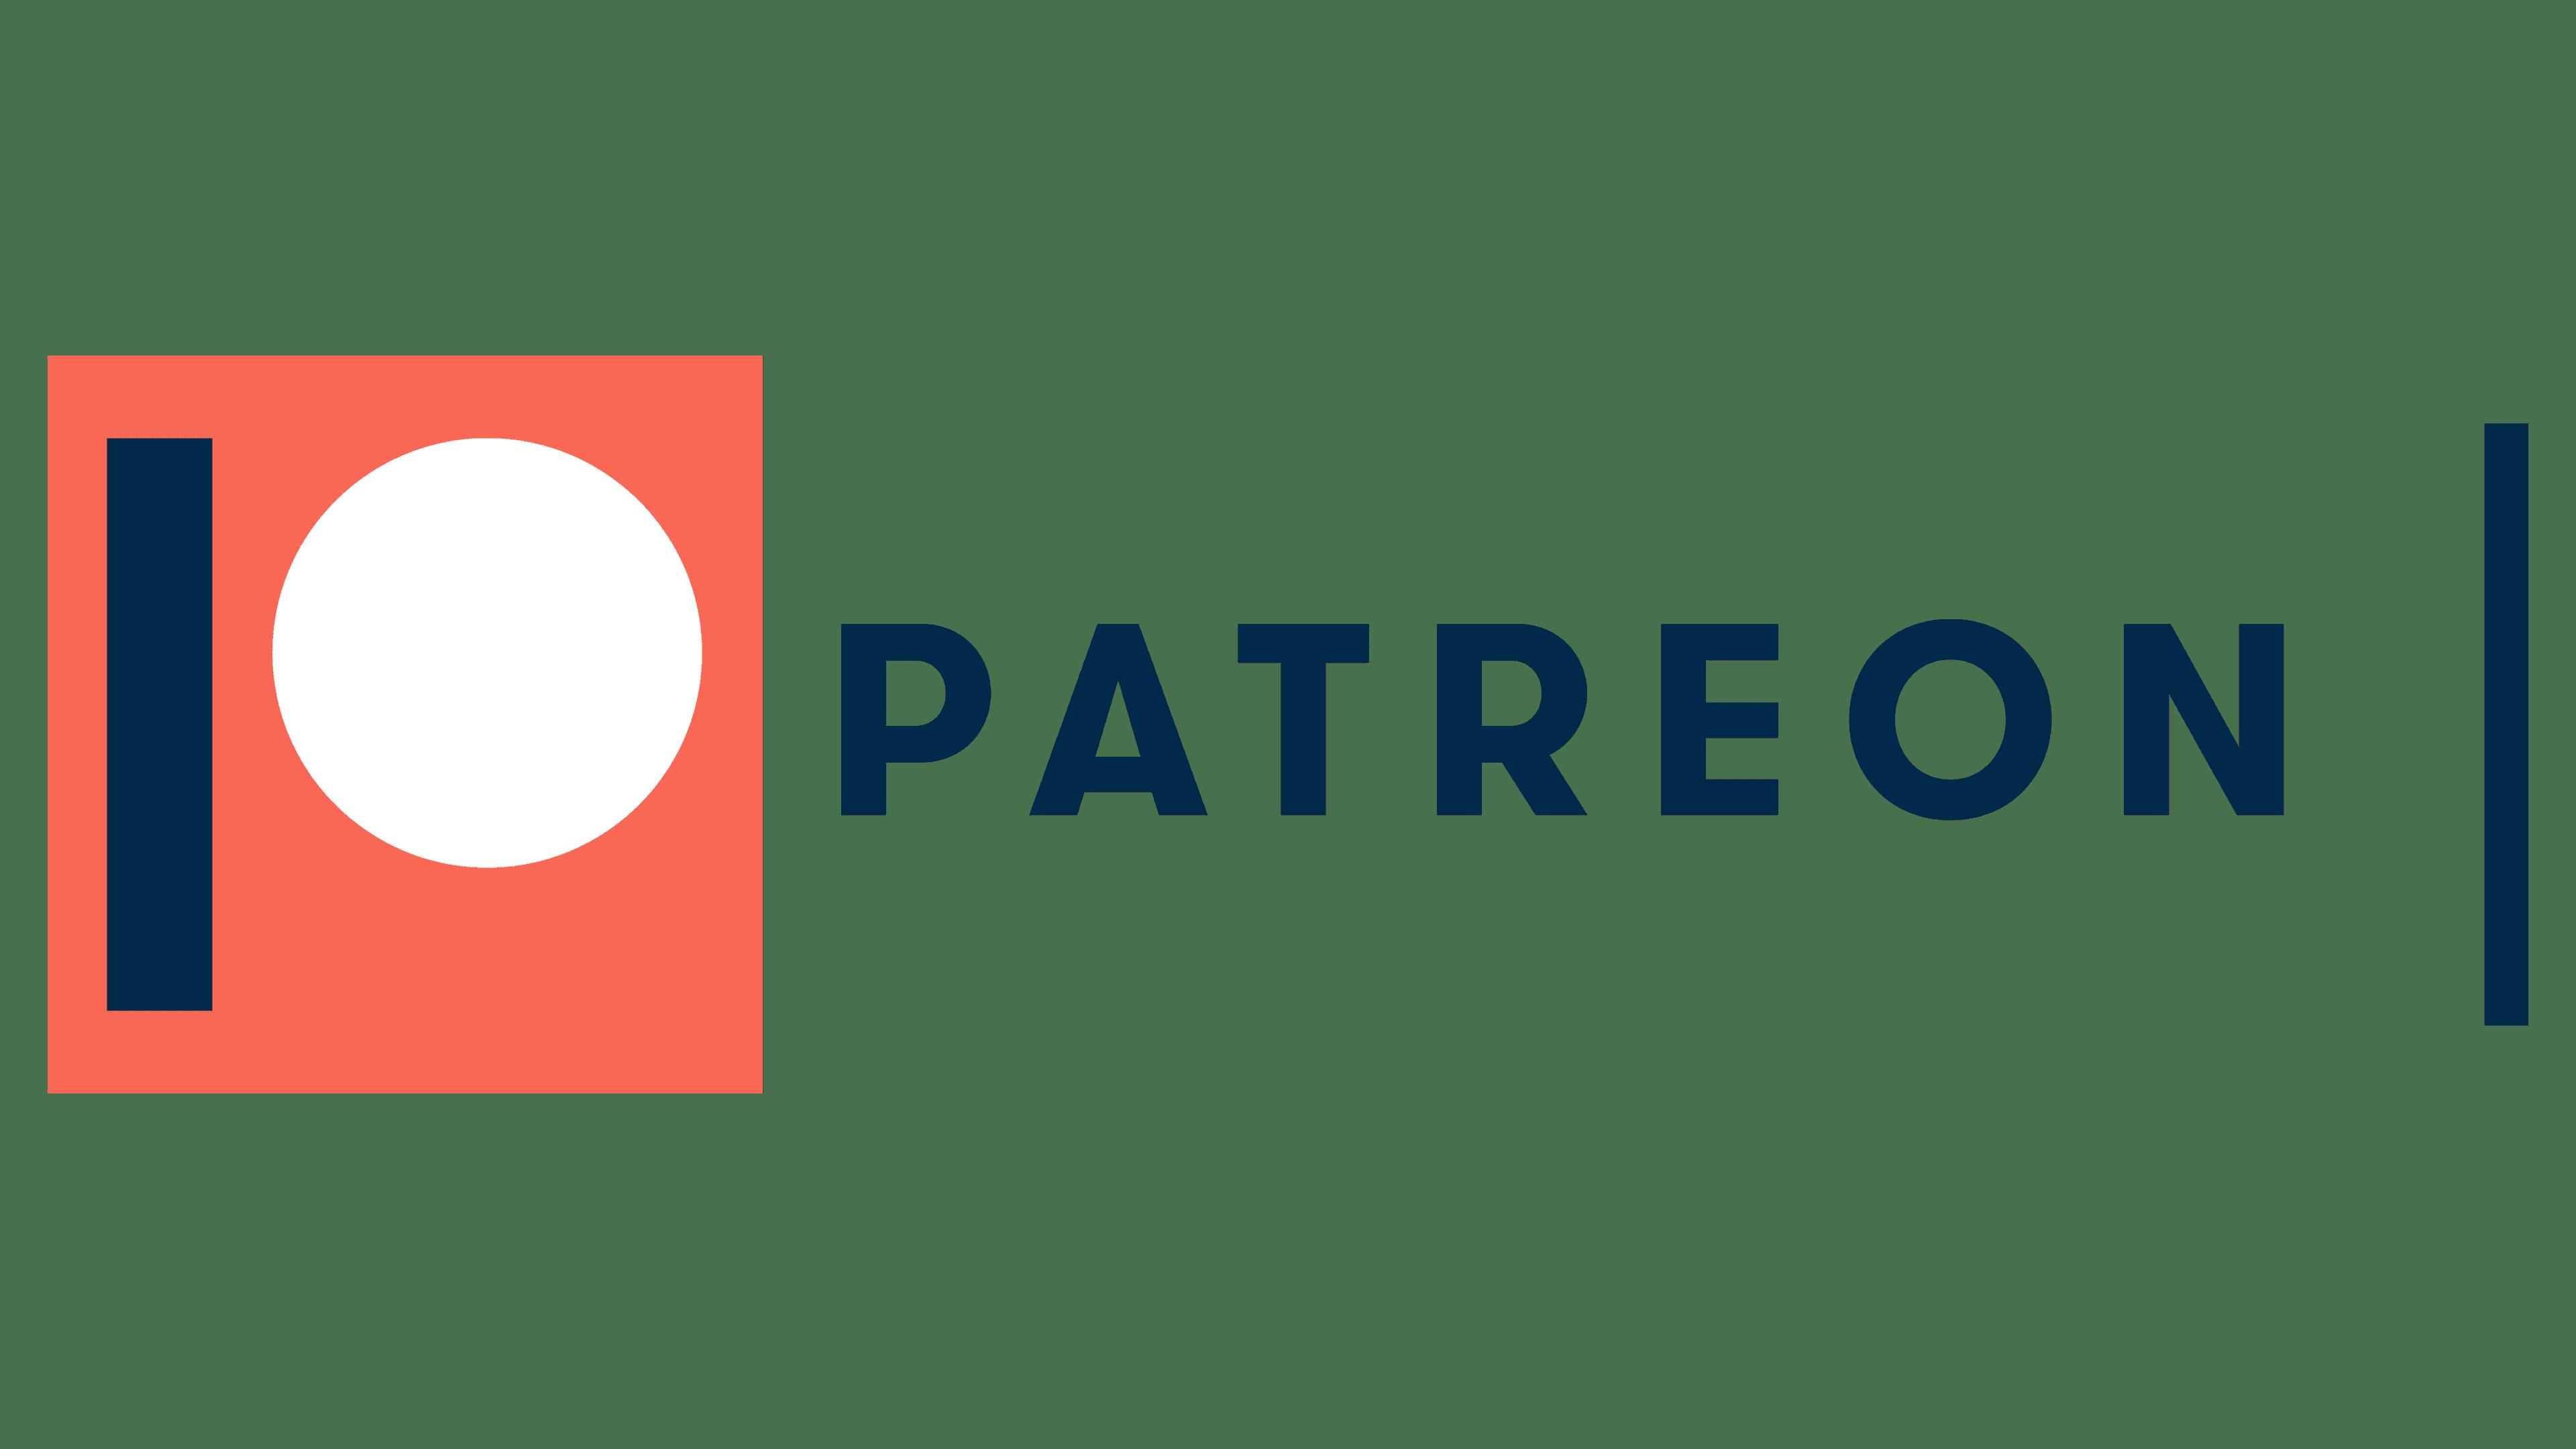 https://logos-marcas.com/wp-content/uploads/2020/11/Patreon-Simbolo.png